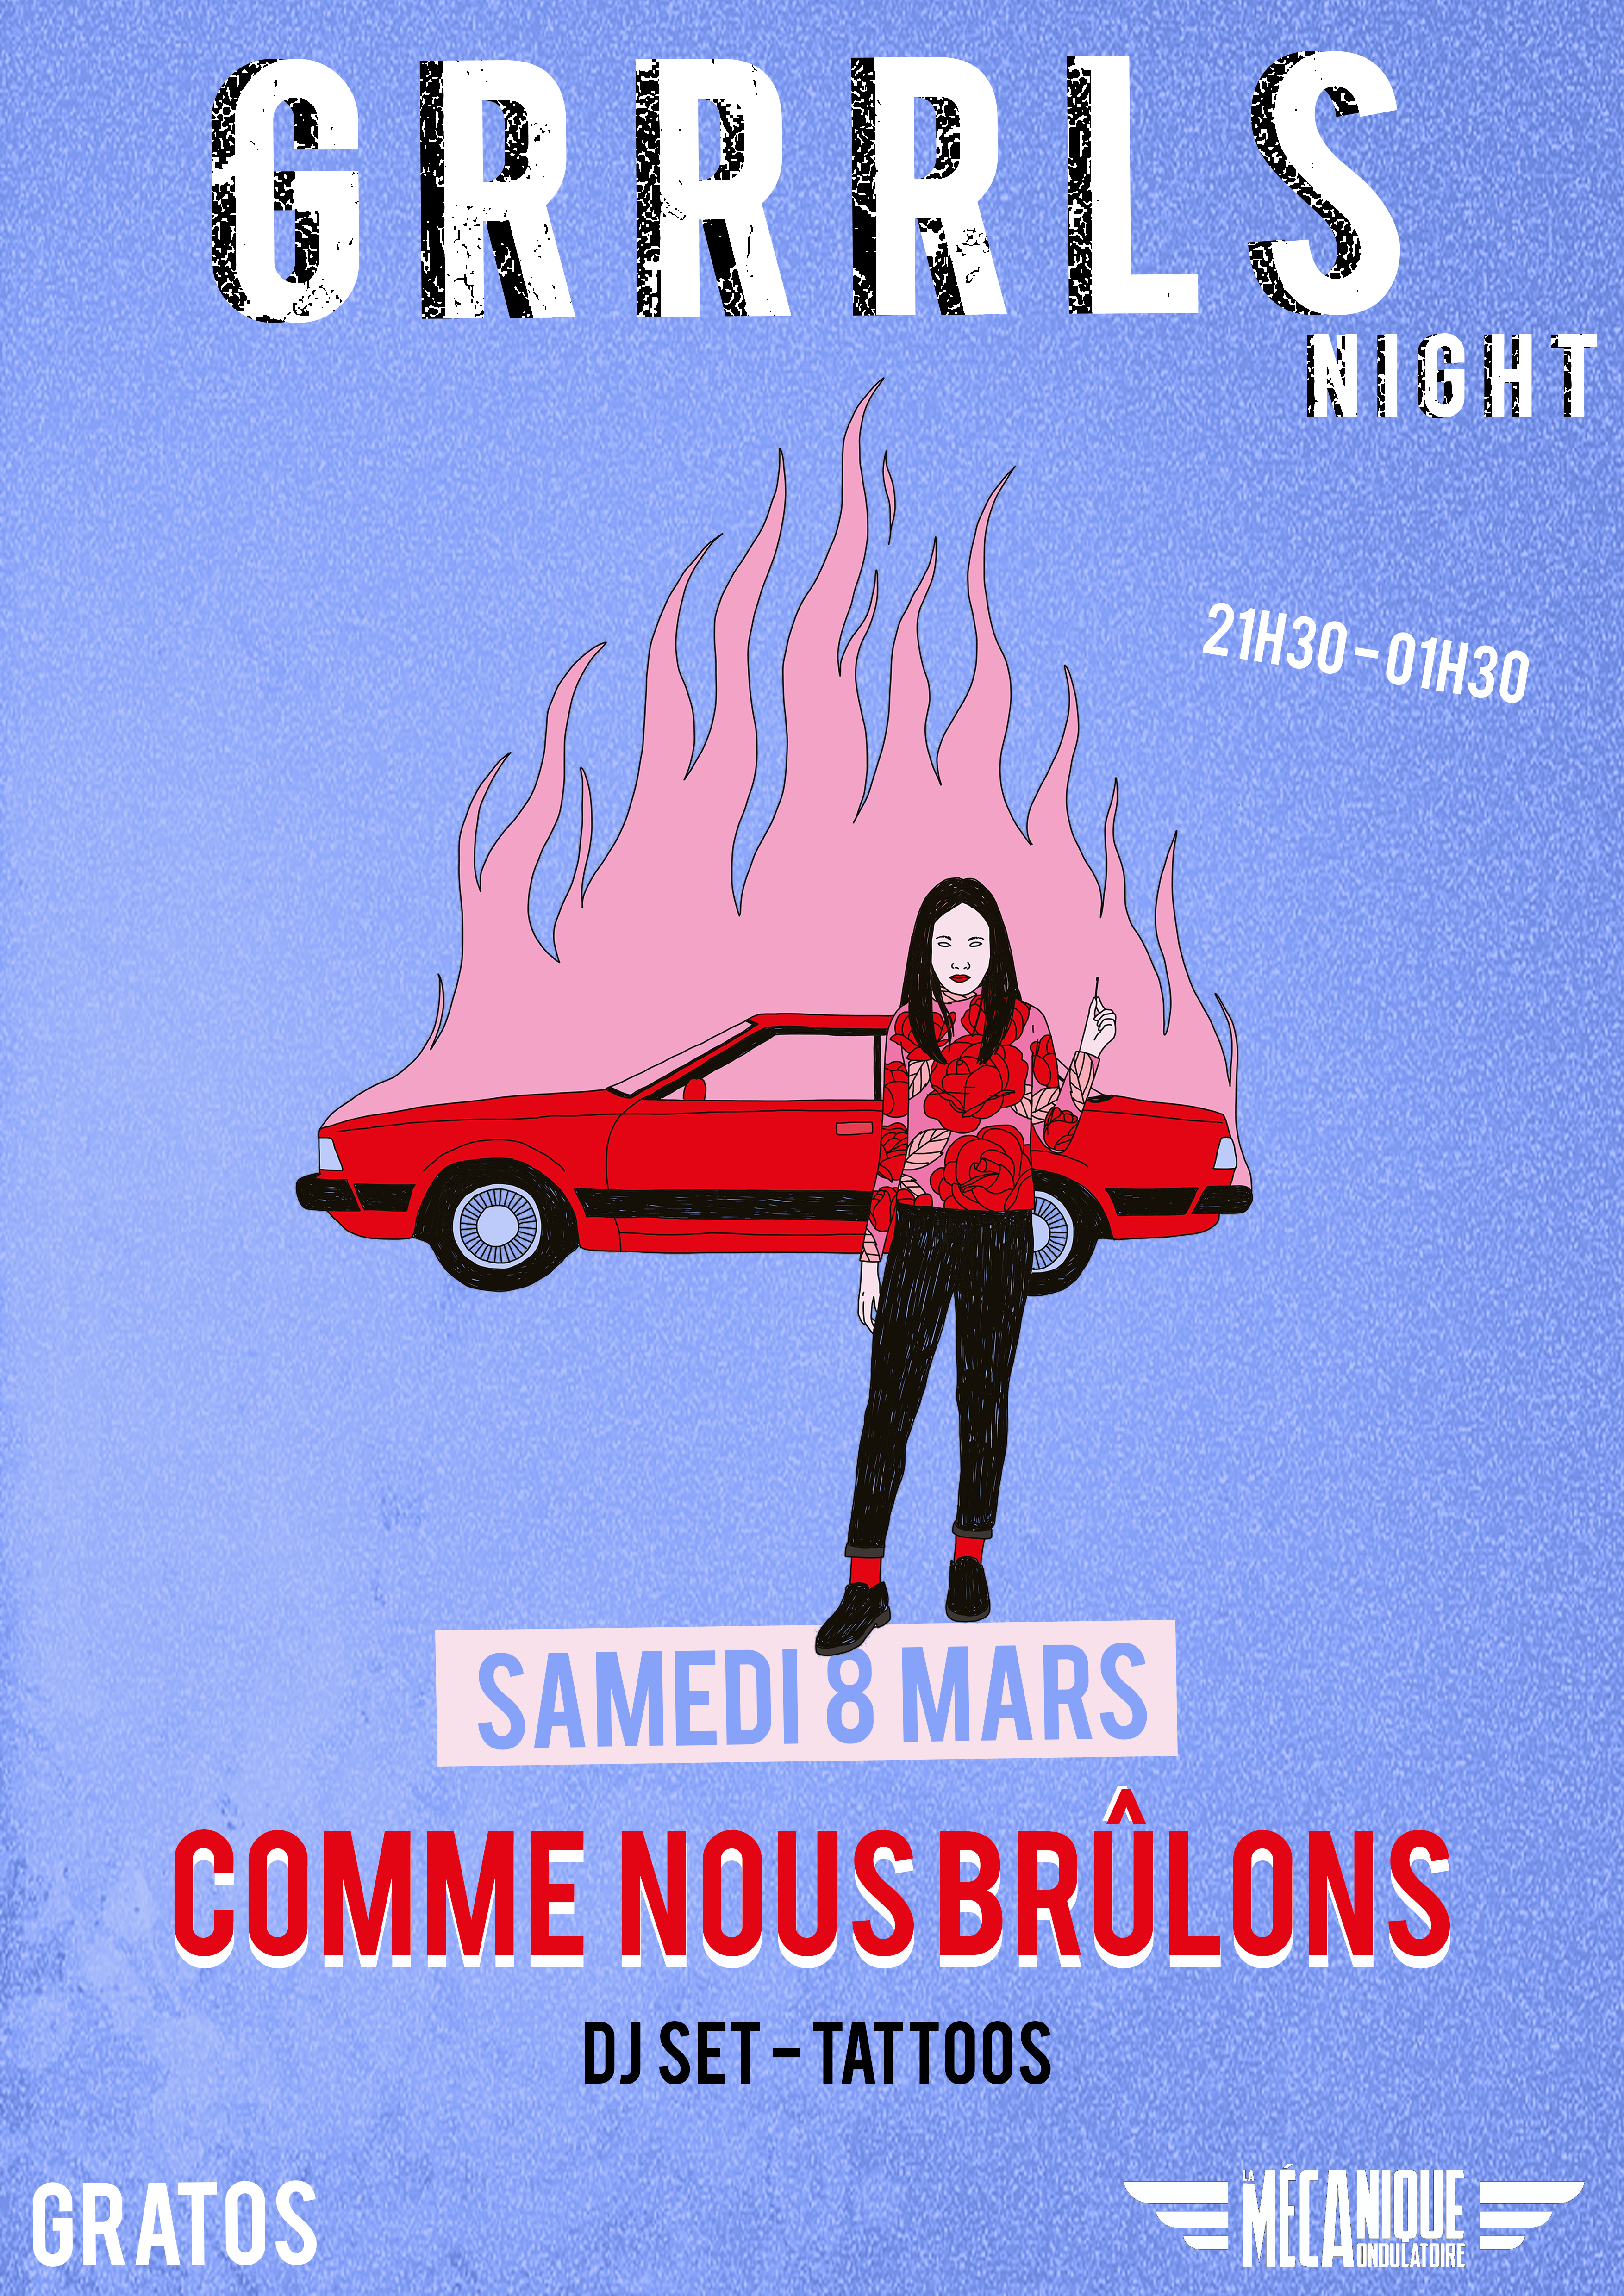 Grrrls Night #1 : Comme Nous Brûlons DJ SET // 08.03